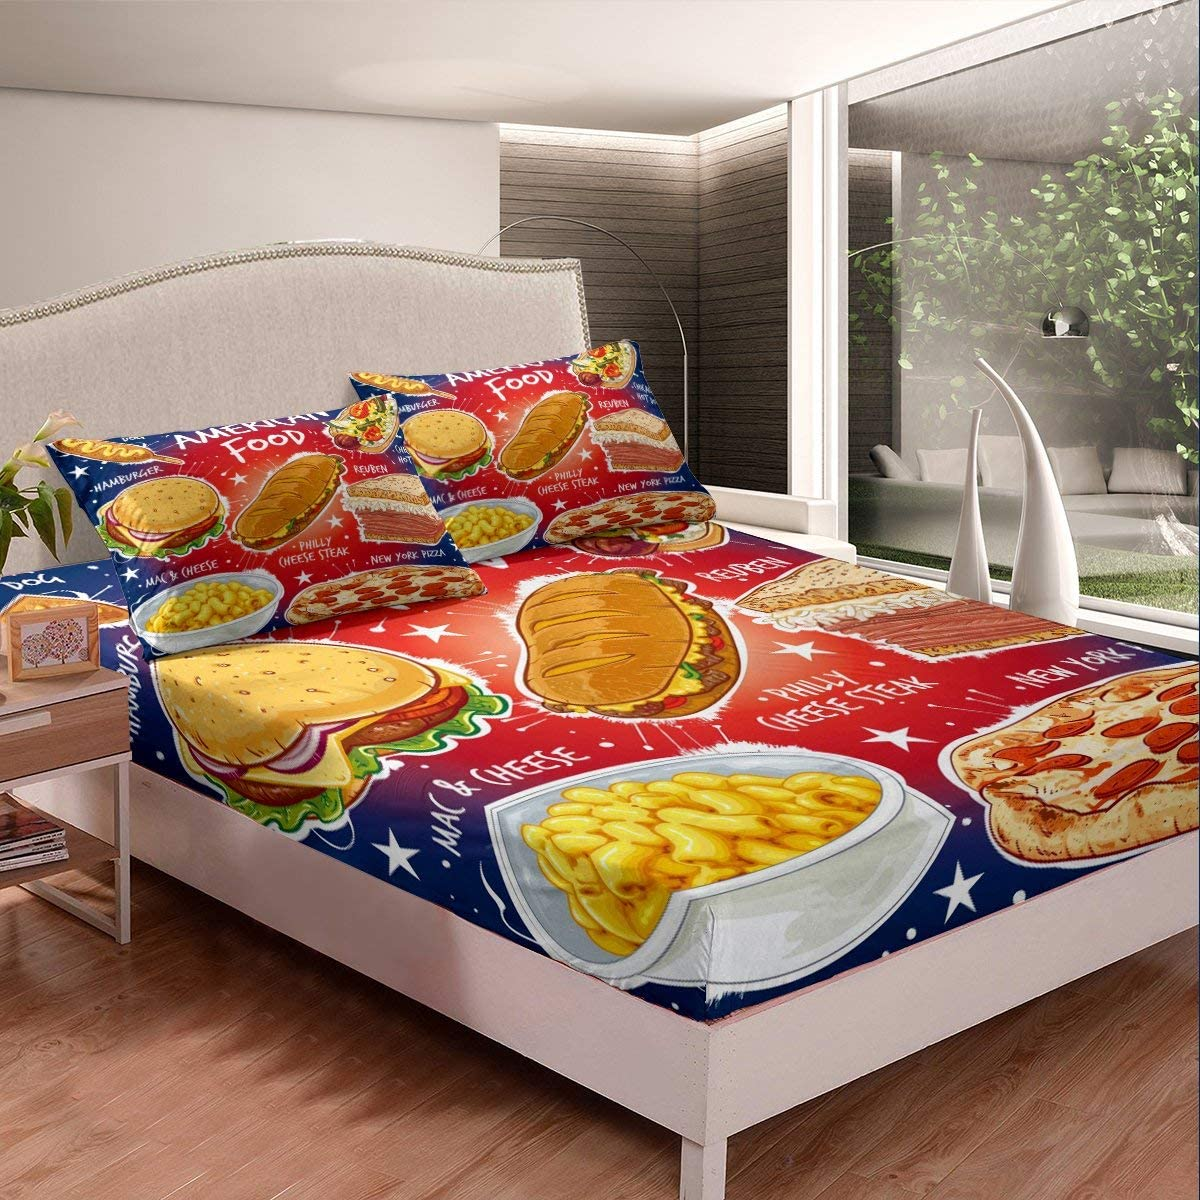 Erosebridal Children Fast Food Bedding Pizza Hamburger Sheet Cheap mail order sales Set Opening large release sale